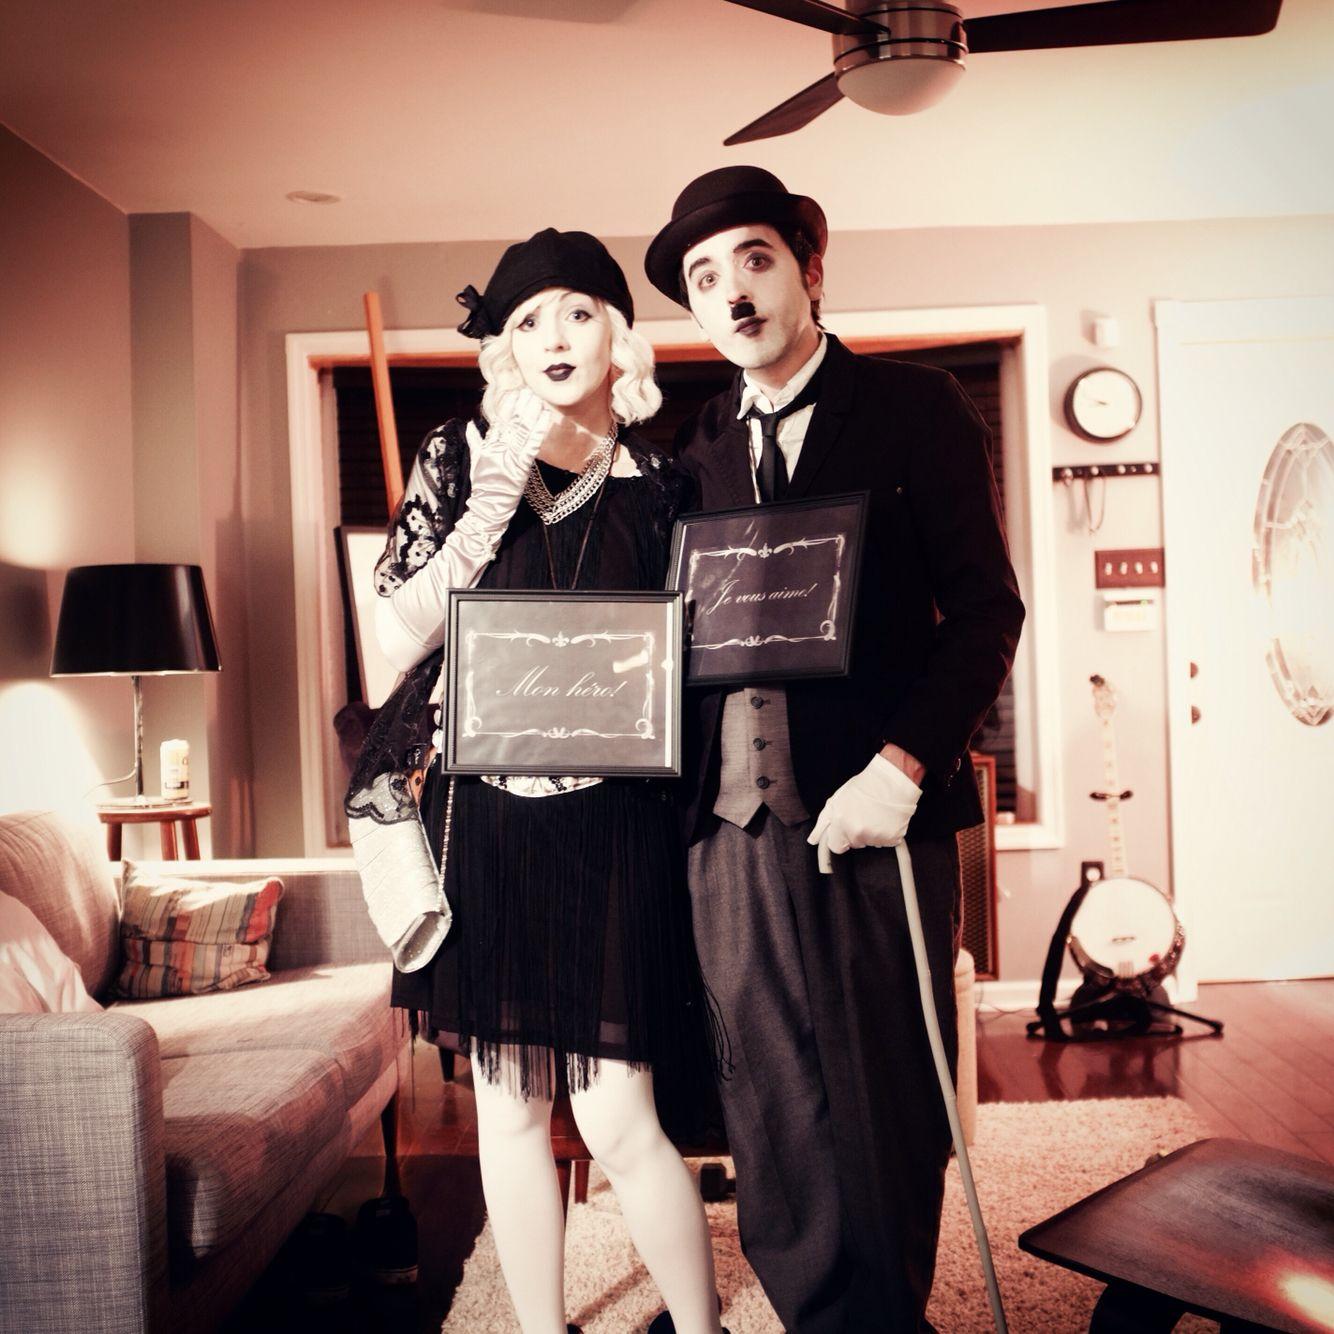 silent film star Halloween costume idea, black and white